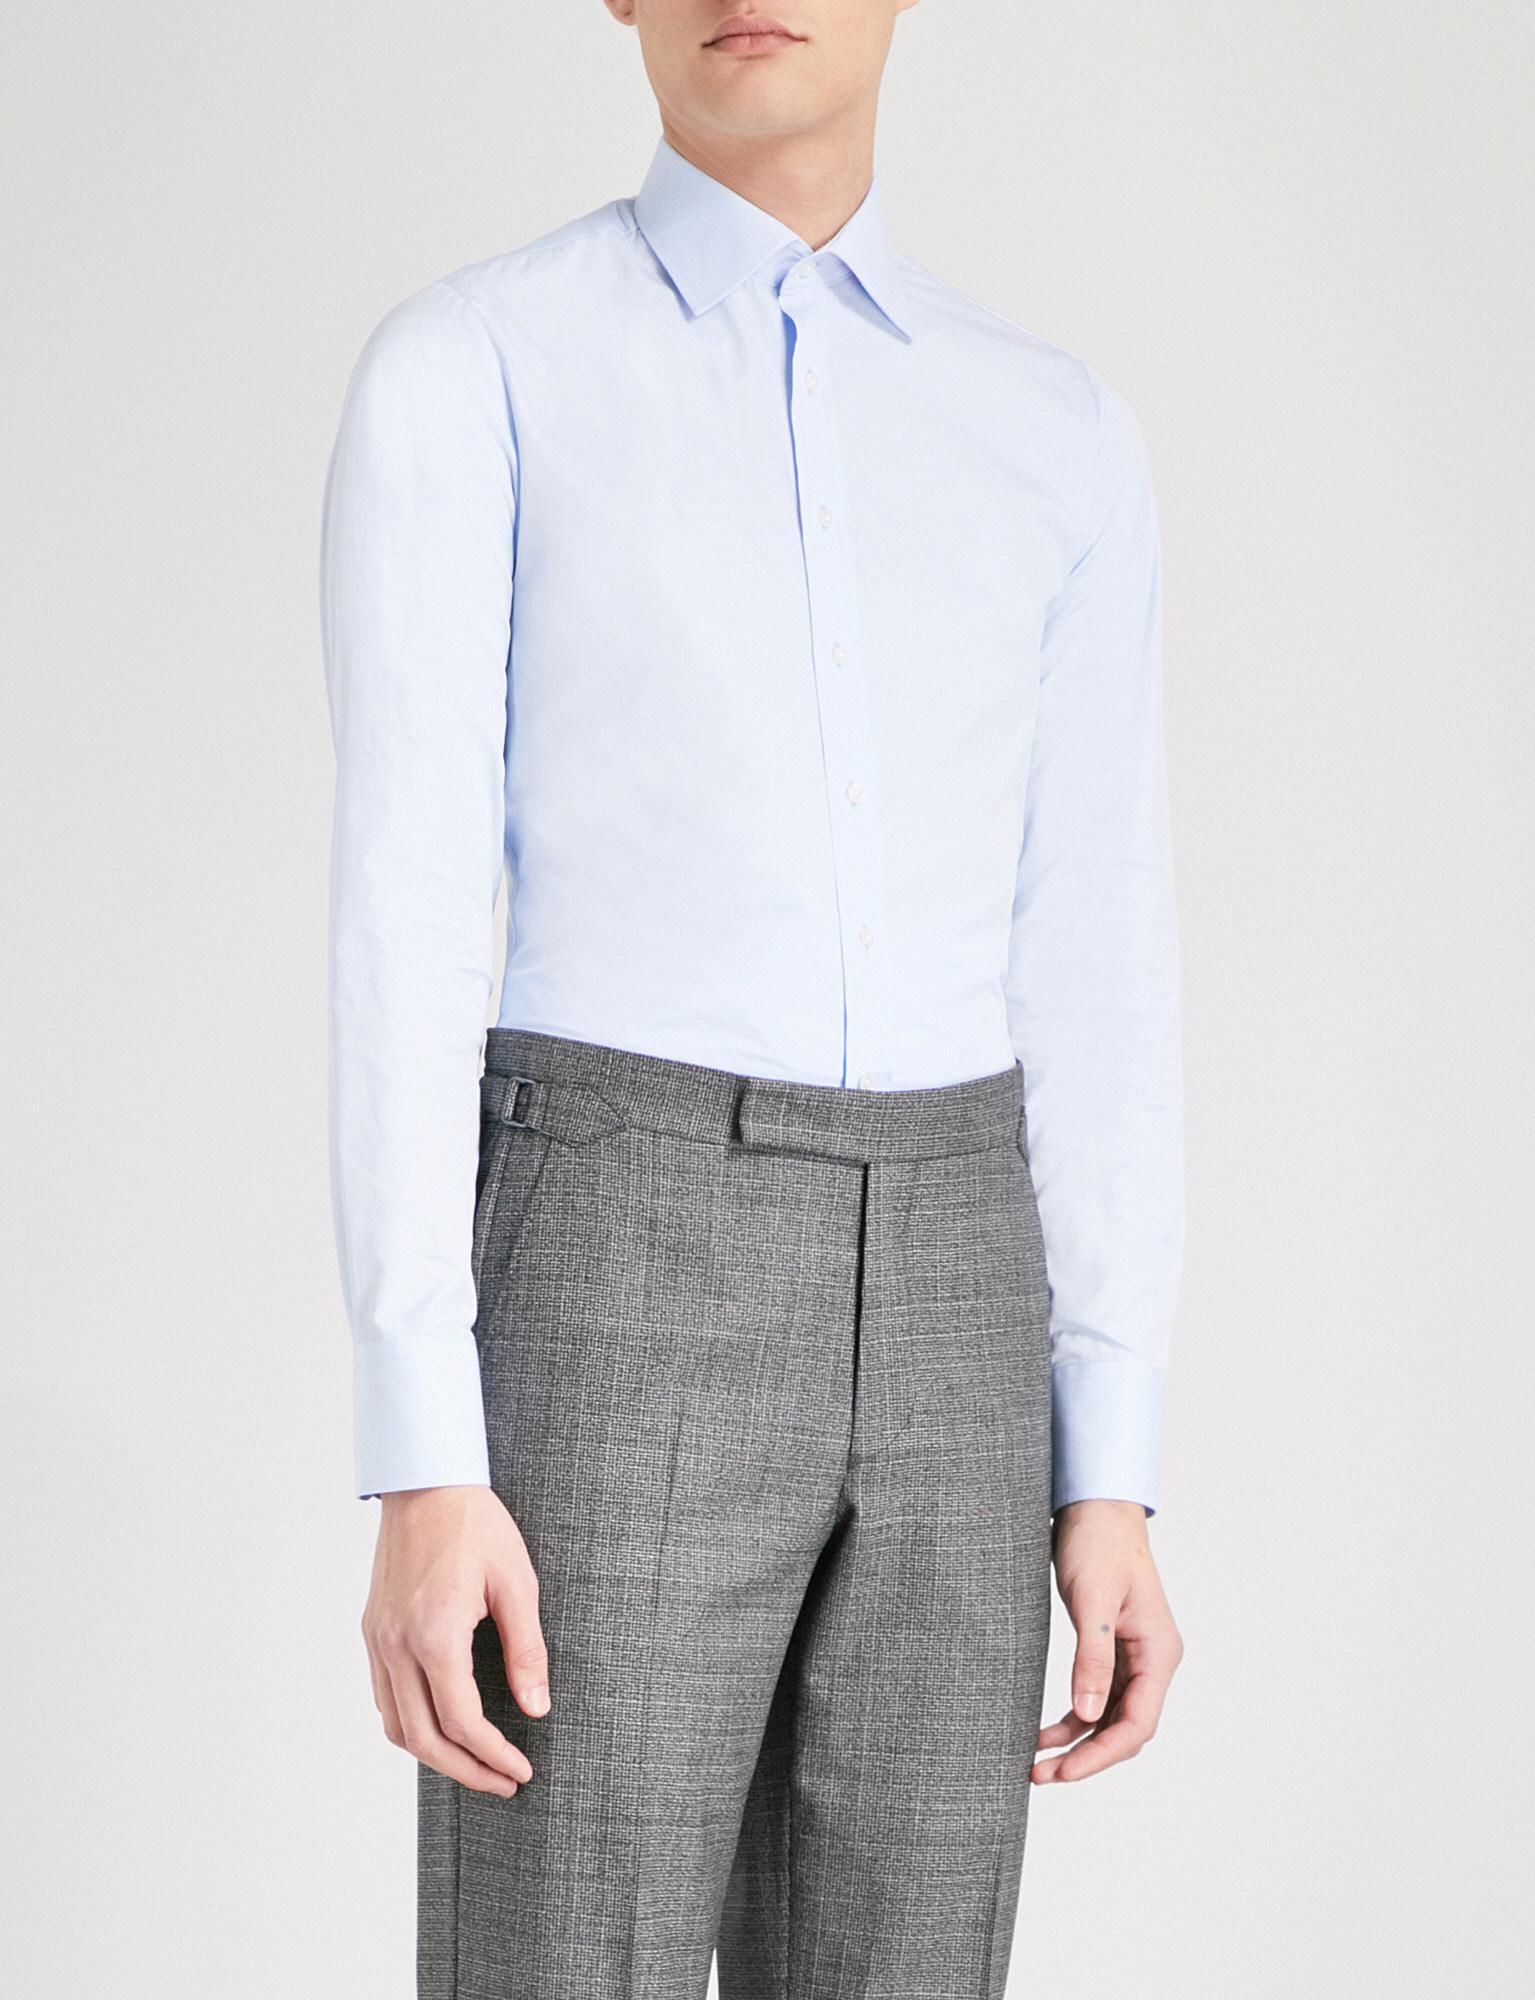 Thomas Pink Frederick Super Slim Fit Cotton Poplin Shirt